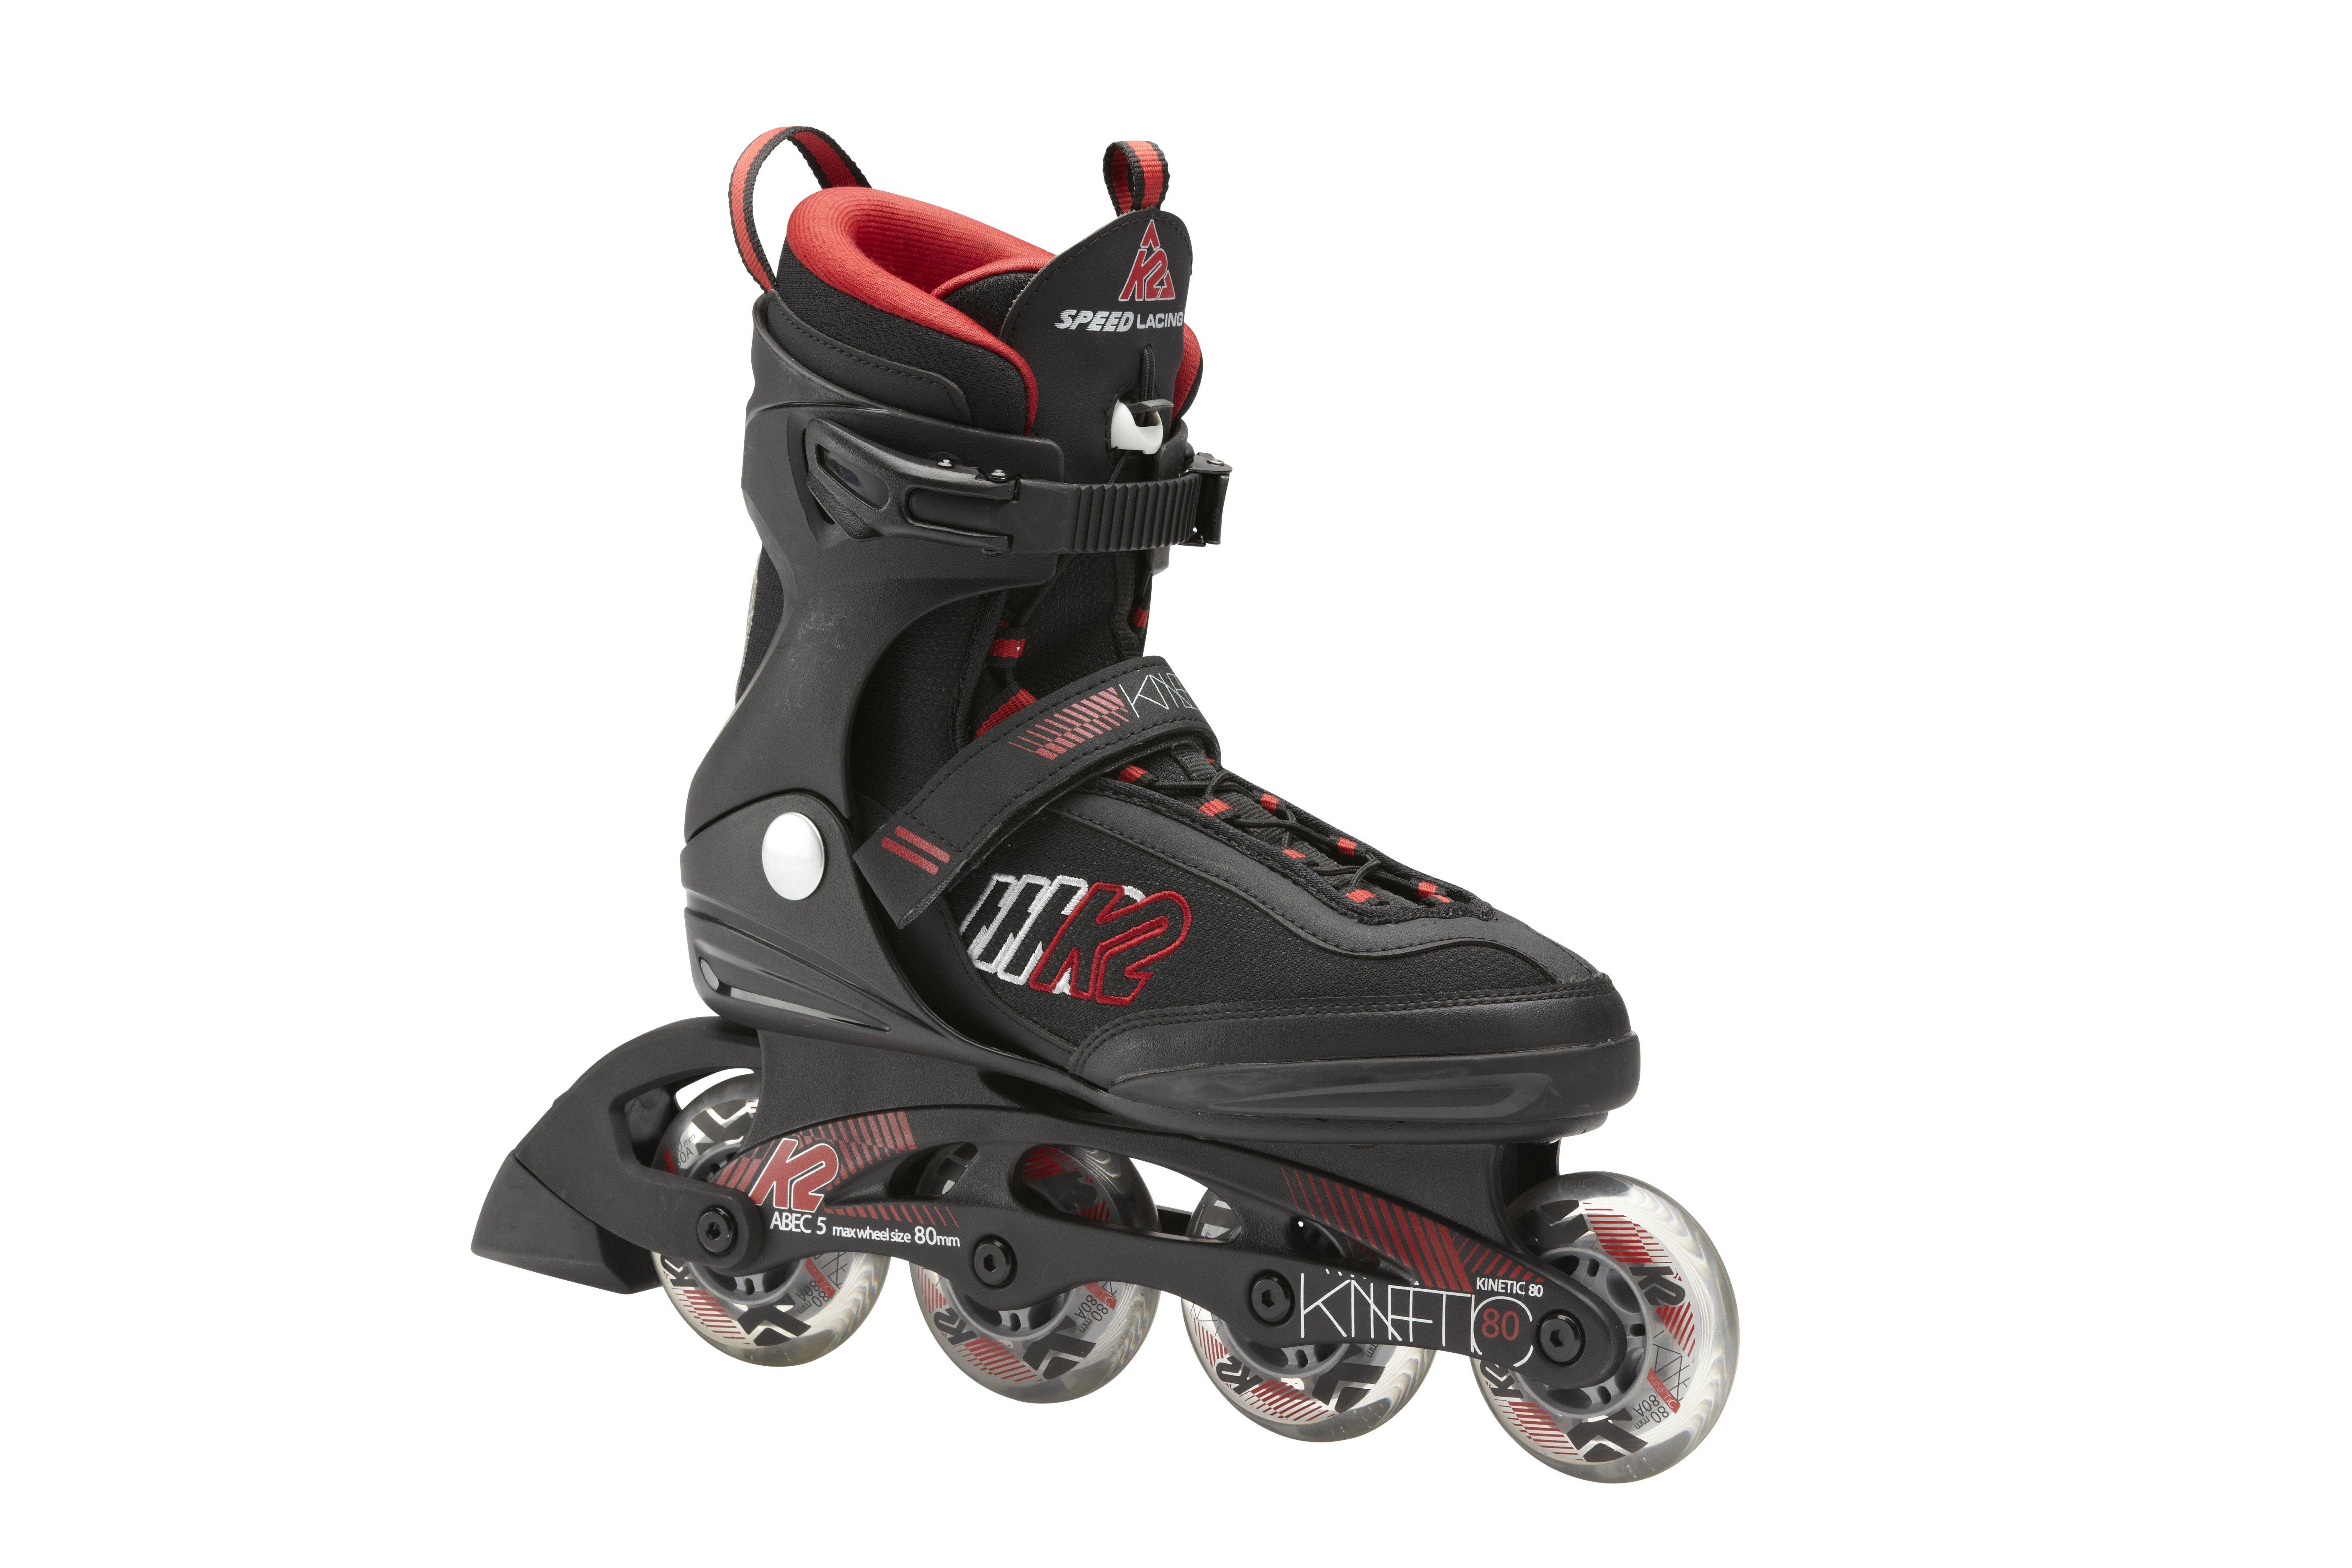 79e9170758c K2 Kinetic 80   Lacing  Speed Lace   Skate Frame  F.B.I.   Wheels  80mm 80a  wheels